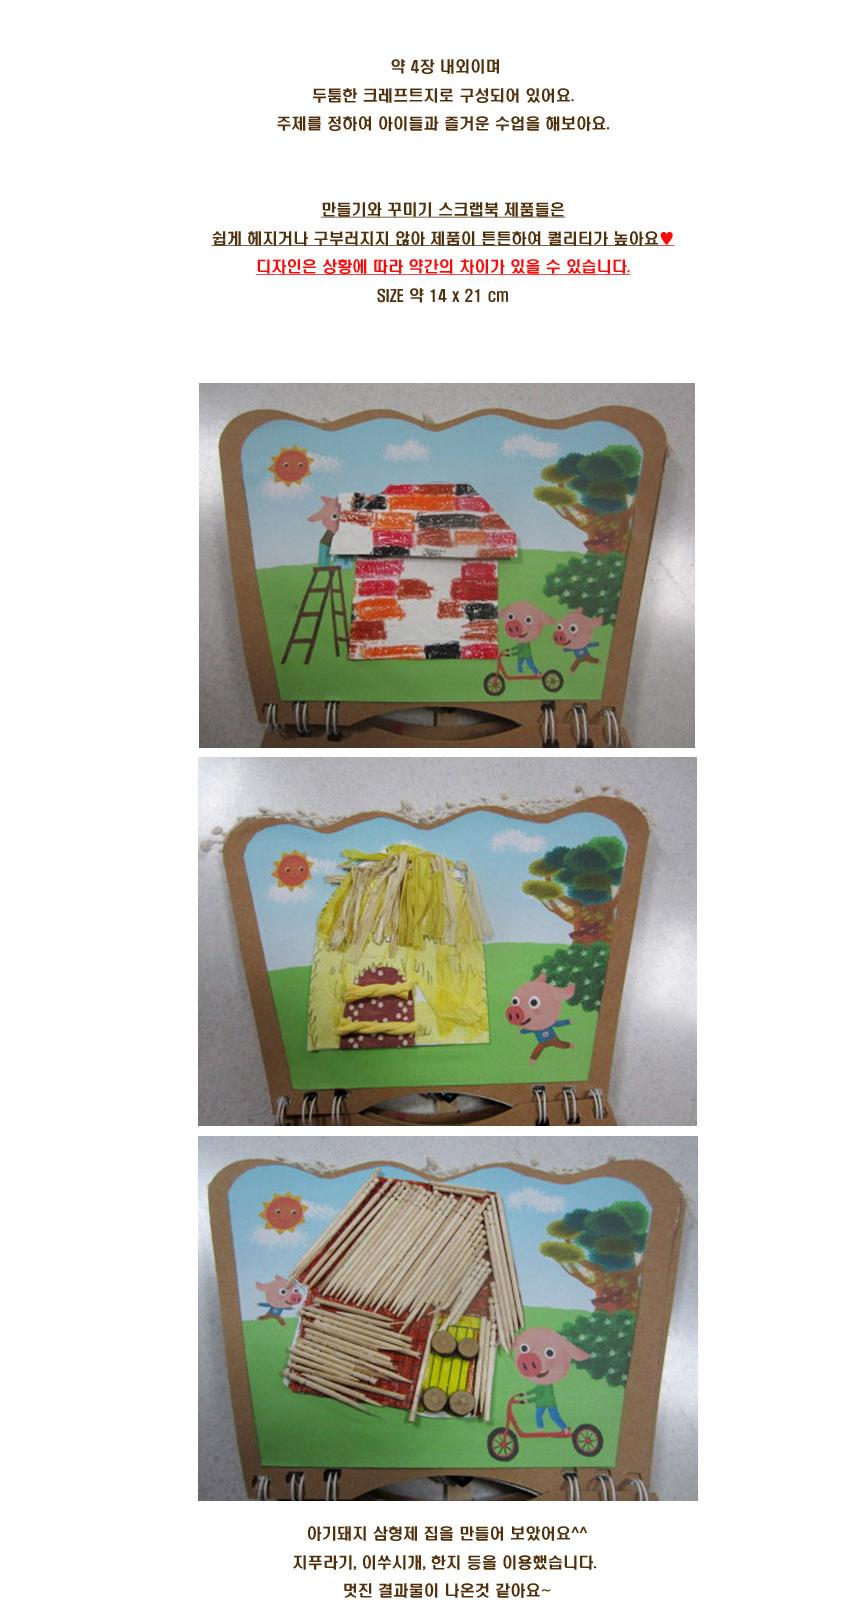 [KC인증]플라워 스크랩북 - 만꾸(만들기와 꾸미기), 2,800원, 종이공예/북아트, 북아트 재료